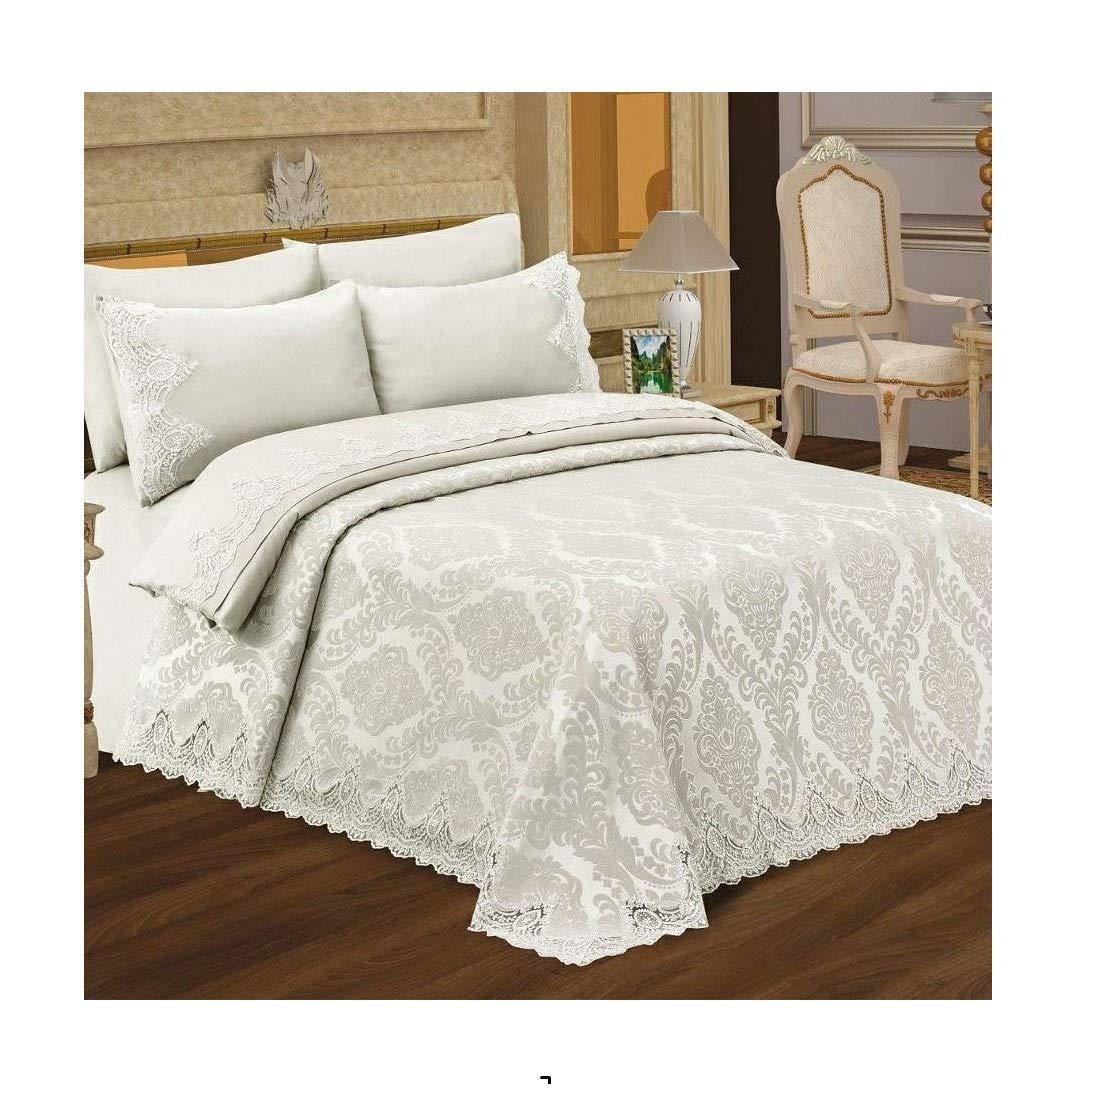 CDM product Pharpar ESINTI 100% Cotton Premium Elegant Bedding Set, 7-Piece Pique Bedspread Coverlet Set and Duvet Cover - Beril small thumbnail image